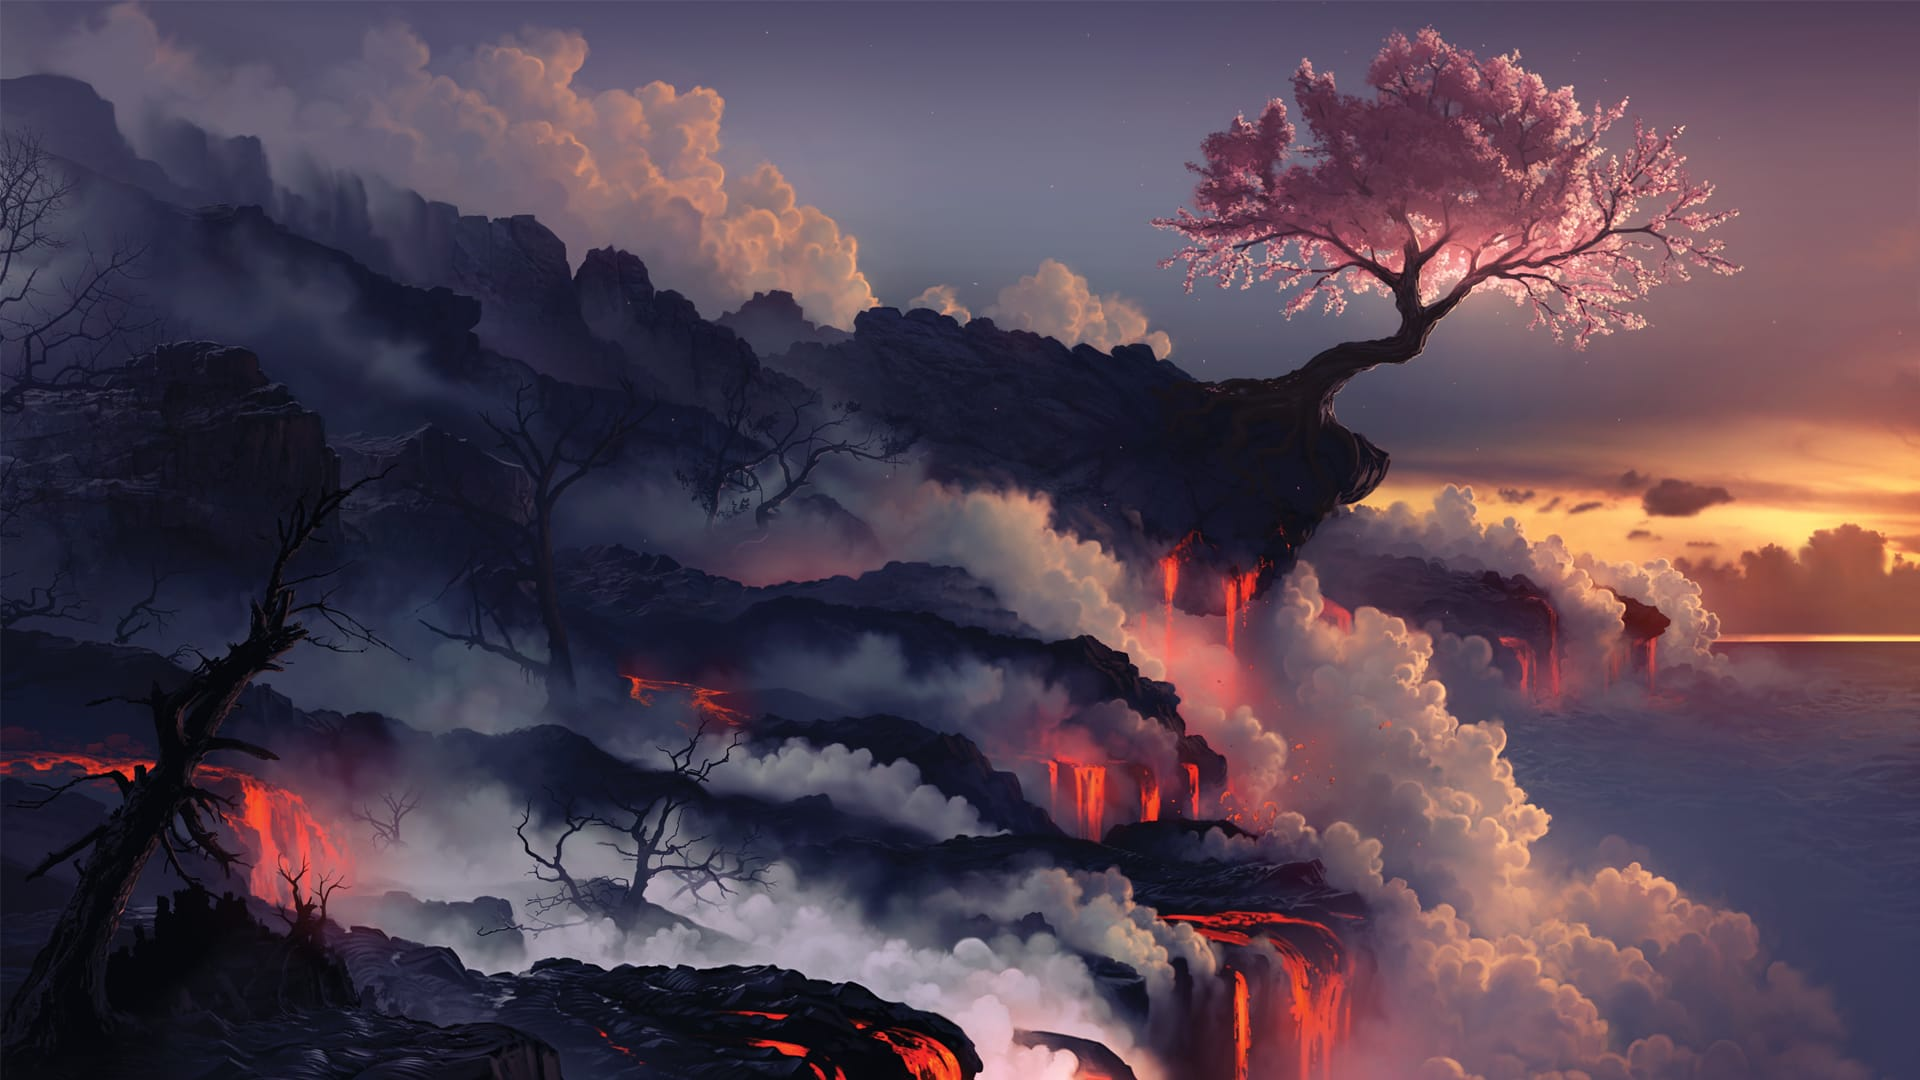 Scorched Earth Desktop Wallpaper by arcipello